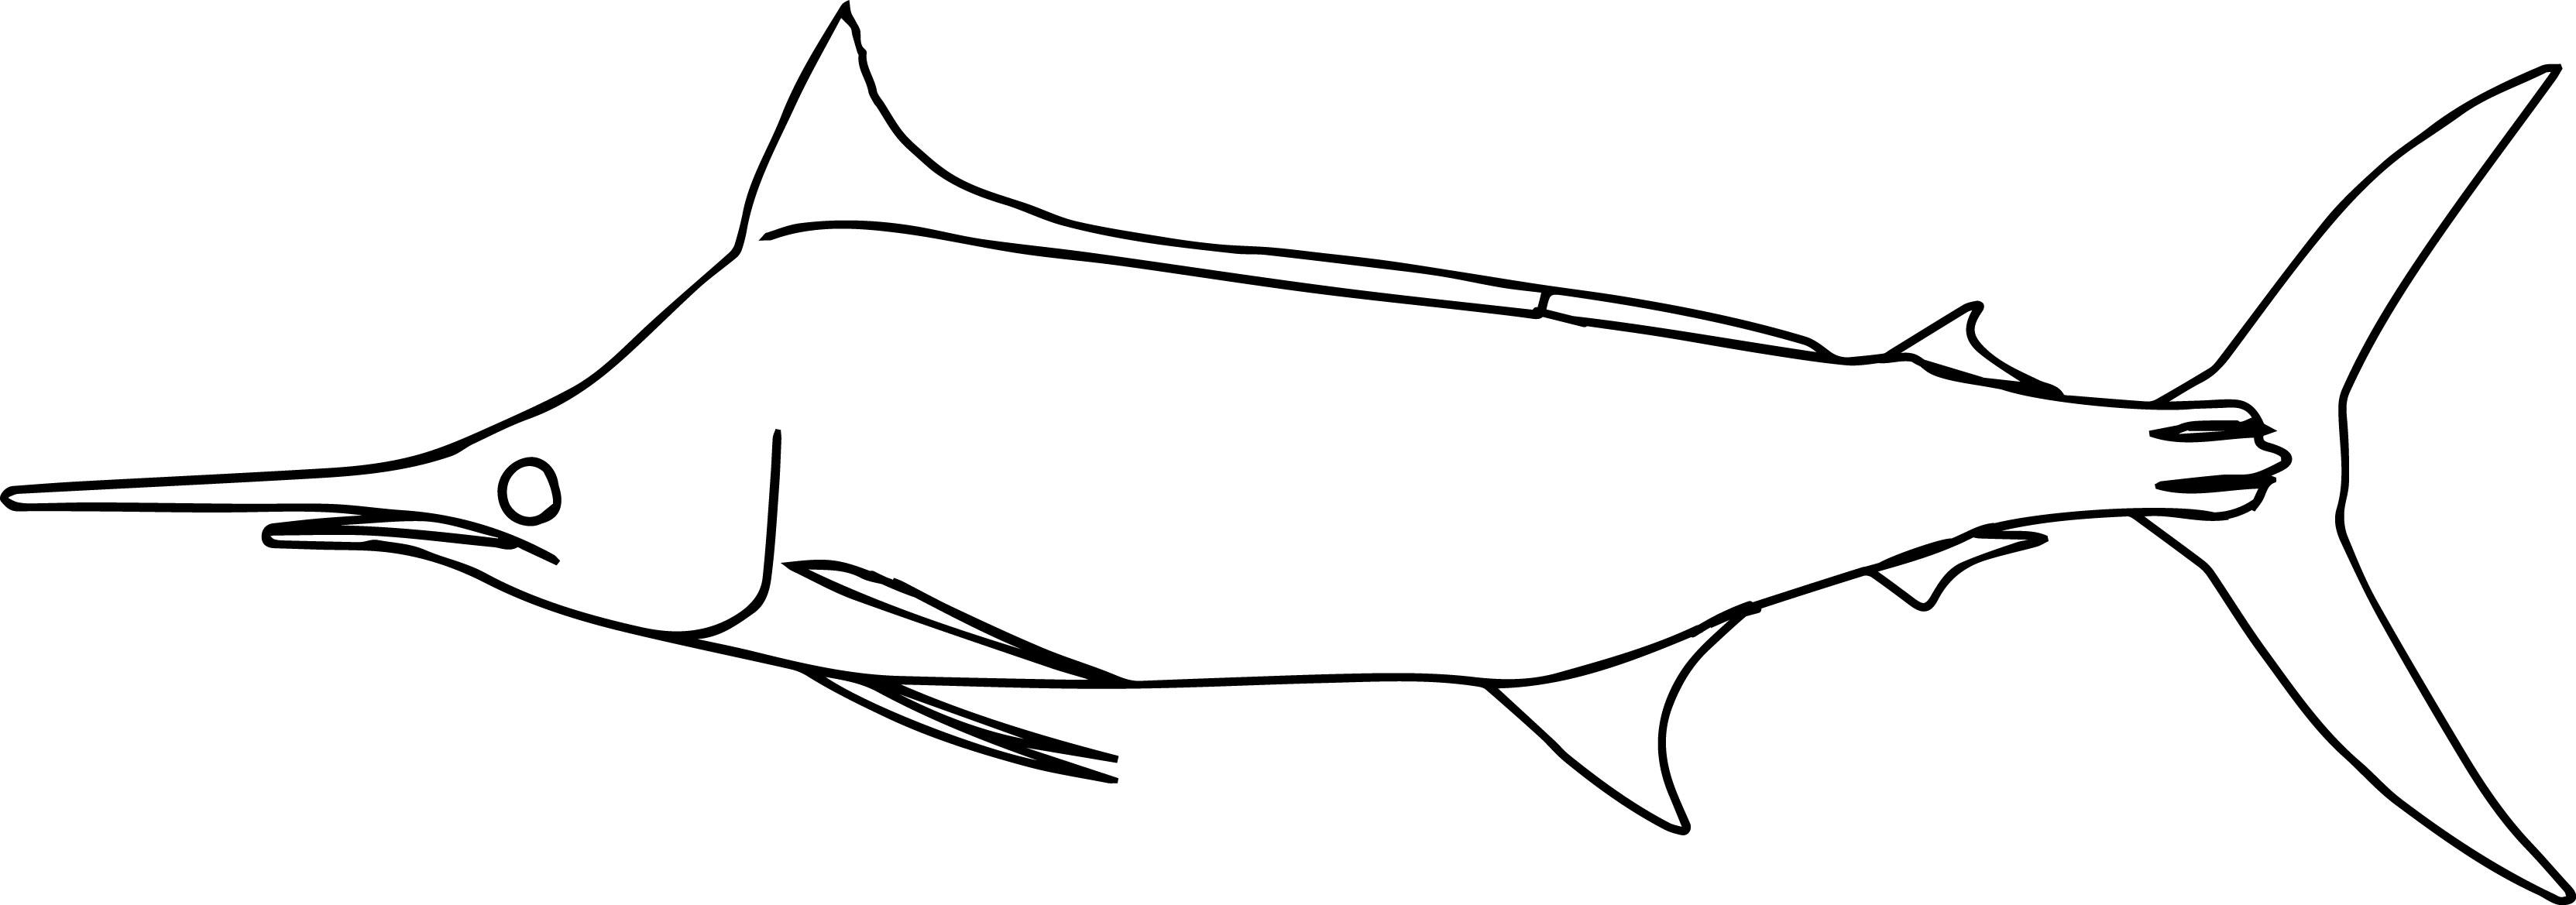 Buluemarlin0 Fish Coloring Page   Wecoloringpage.com